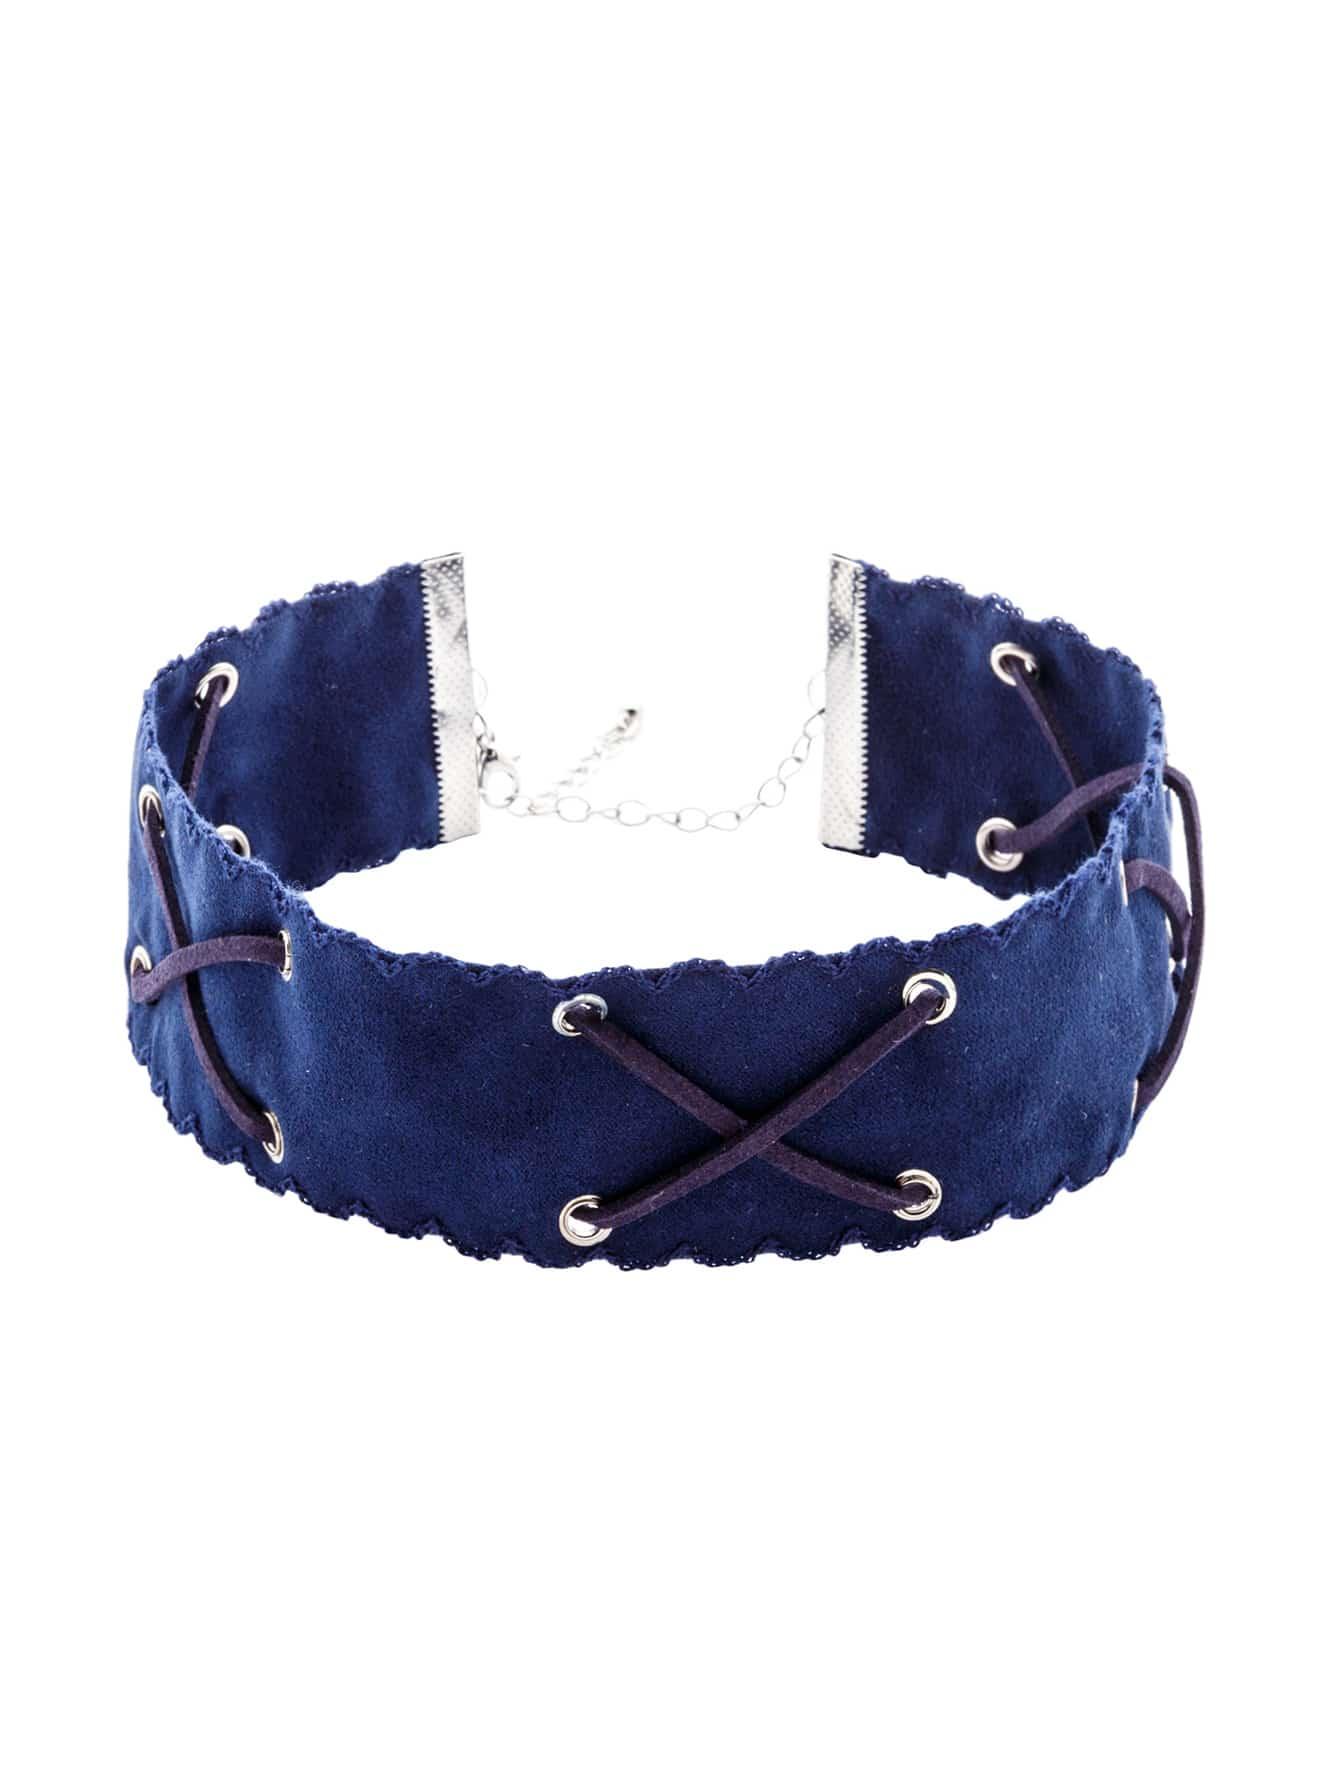 Фото Blue Crisscross Band Wide Choker Necklace. Купить с доставкой